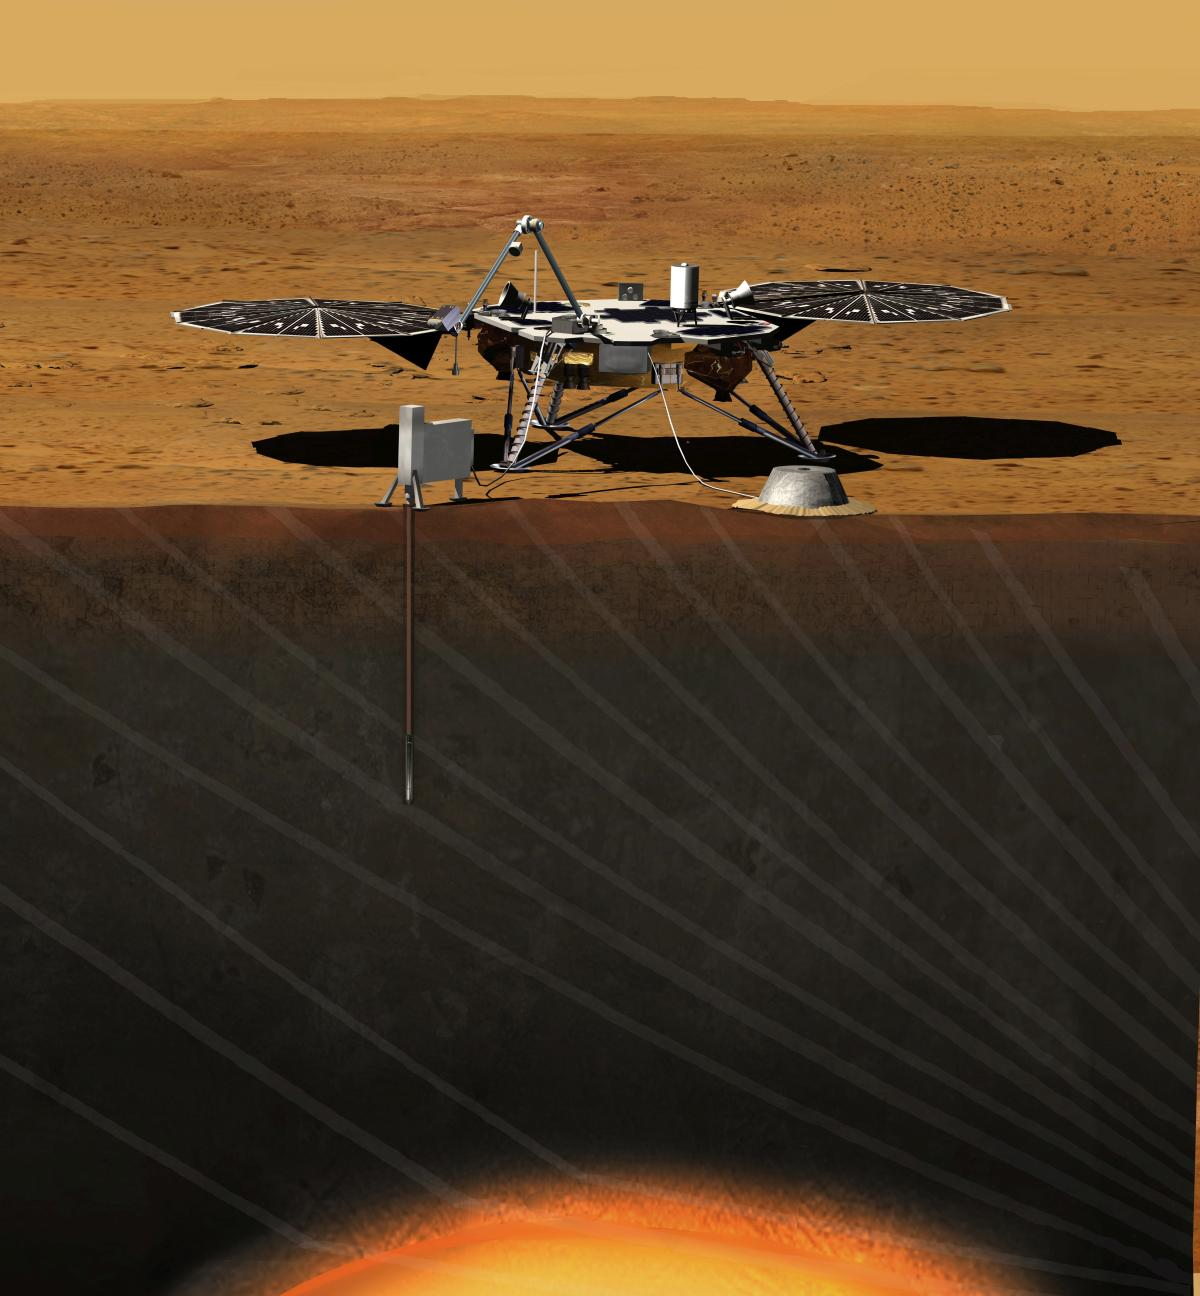 insight mars rover live stream - photo #14